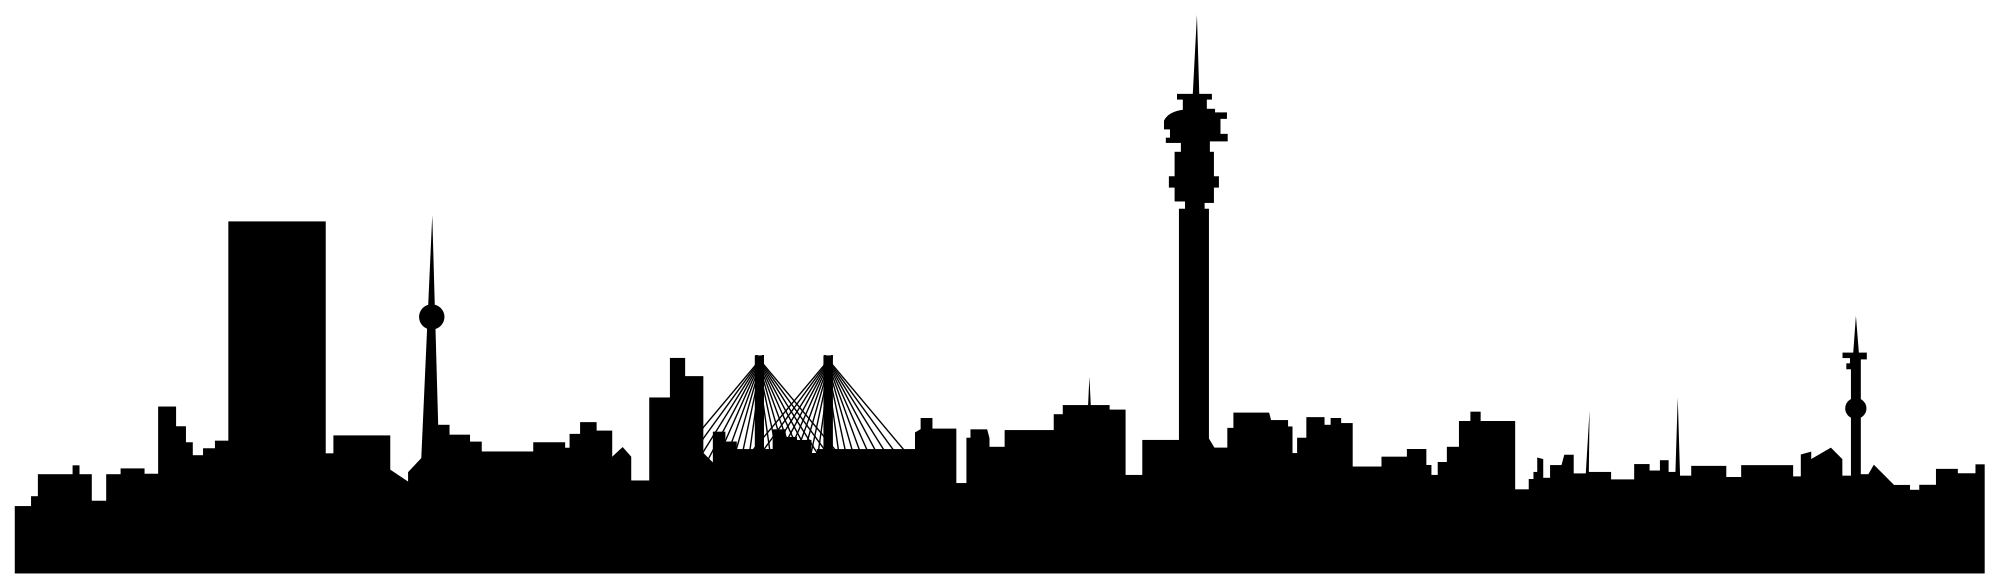 2000x588 Johannesburg Skyline Silhouette